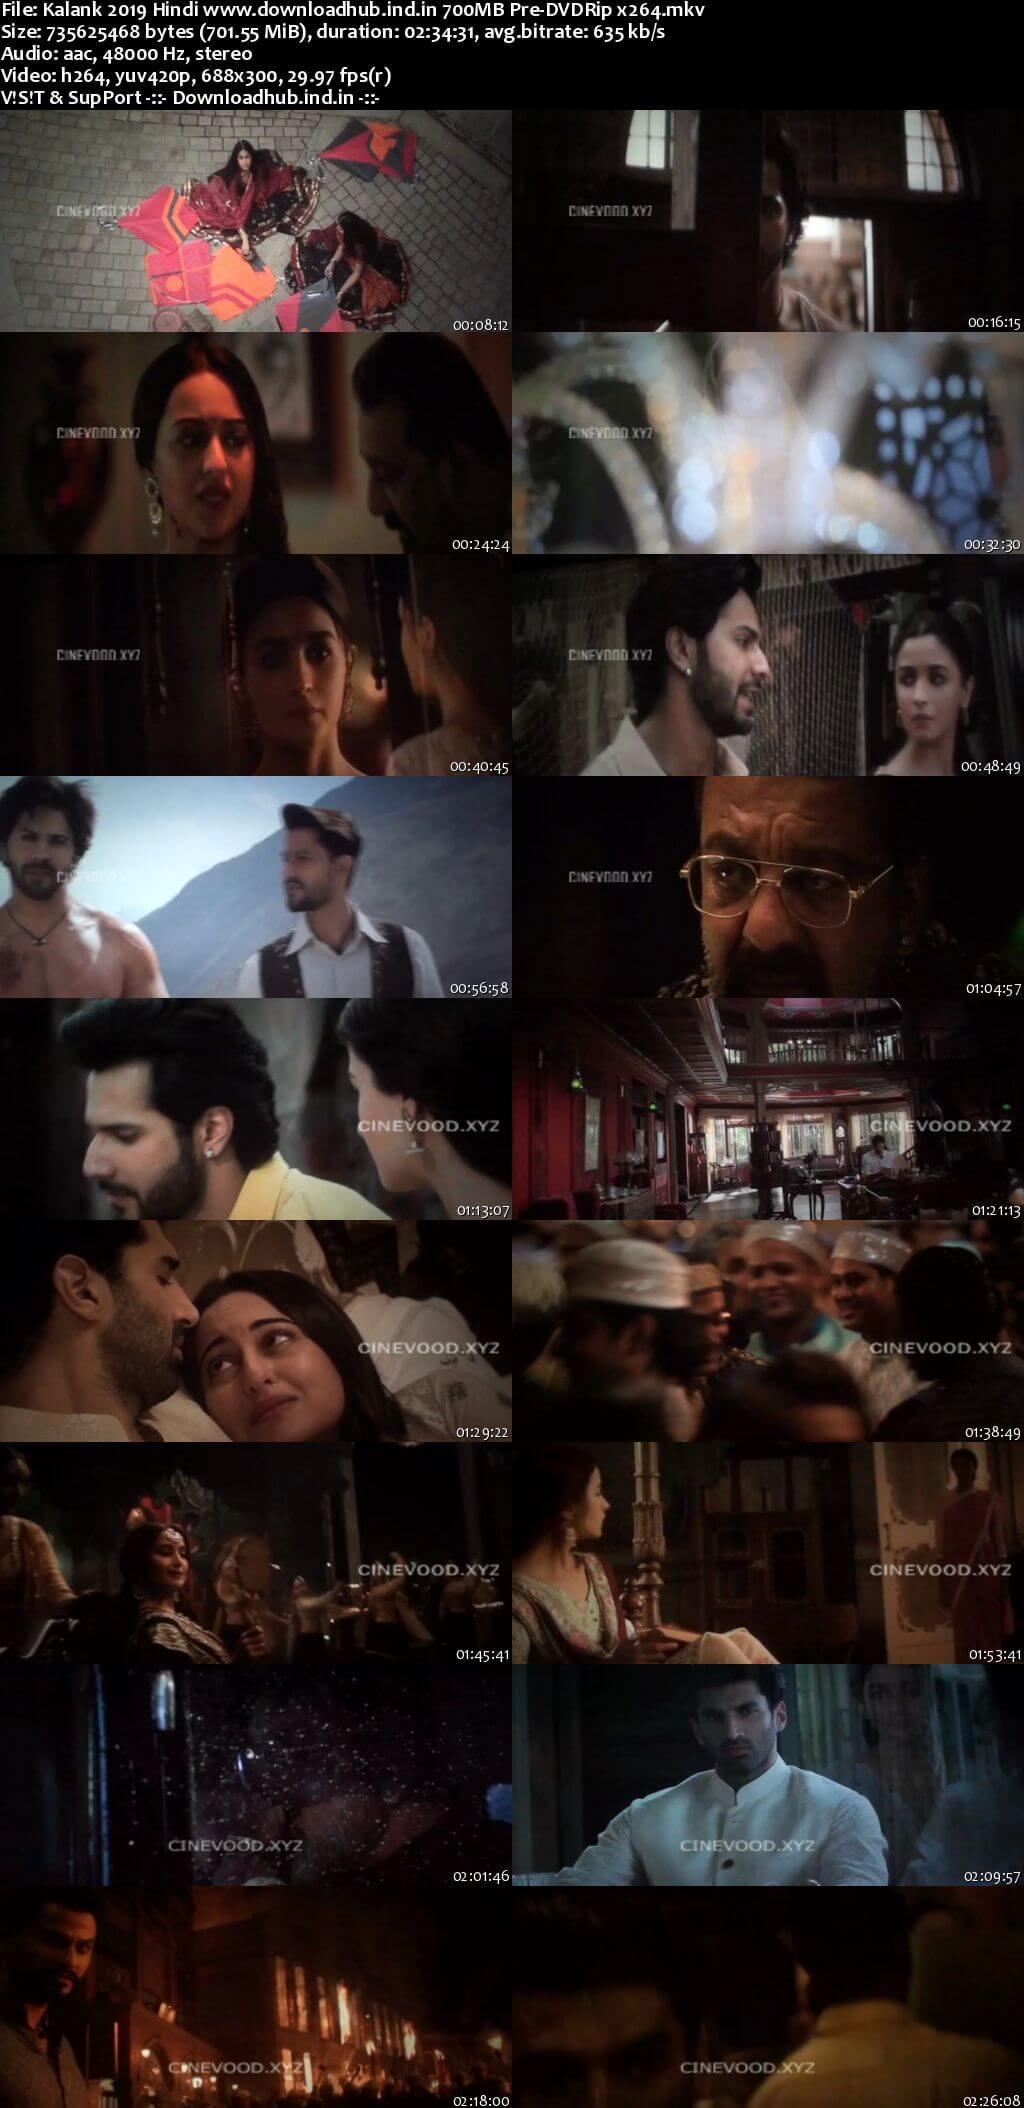 Kalank 2019 Hindi 700MB Pre-DVDRip x264